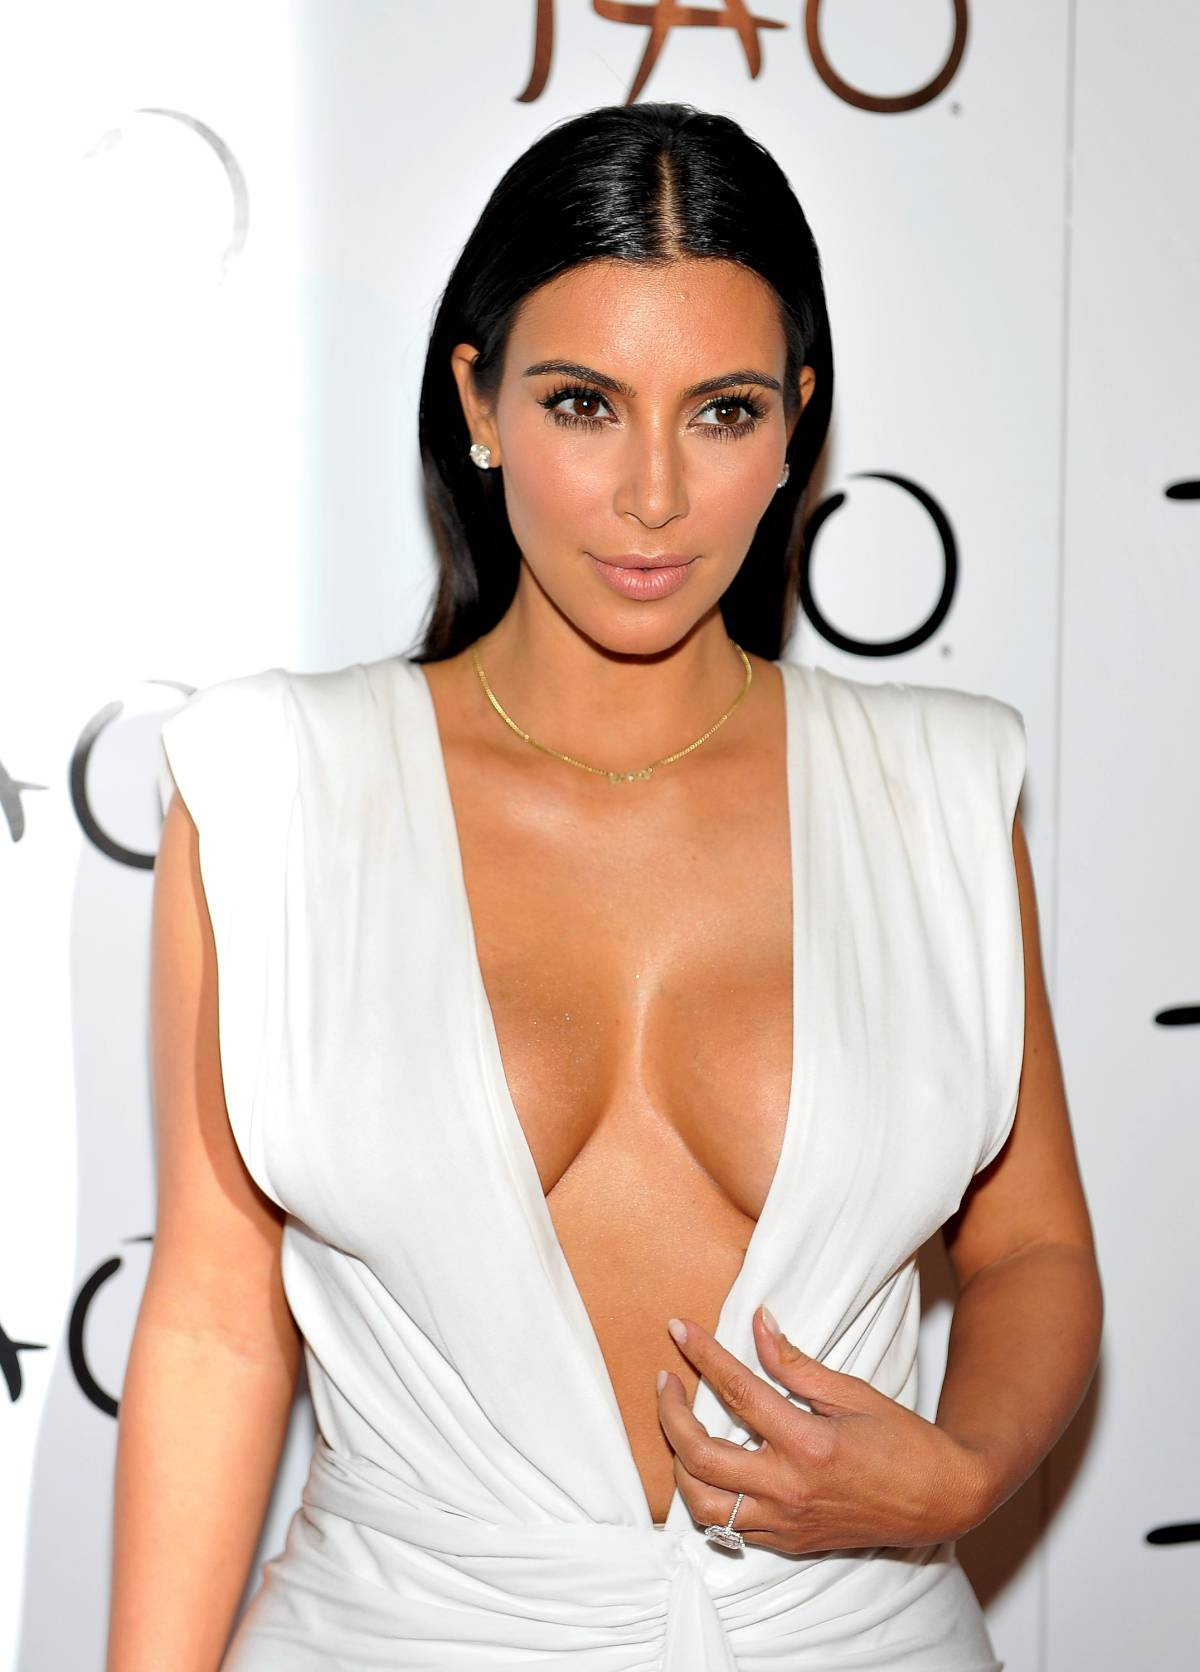 Kim Kardashian Cleavage at Tao Night Club in Las Vegas